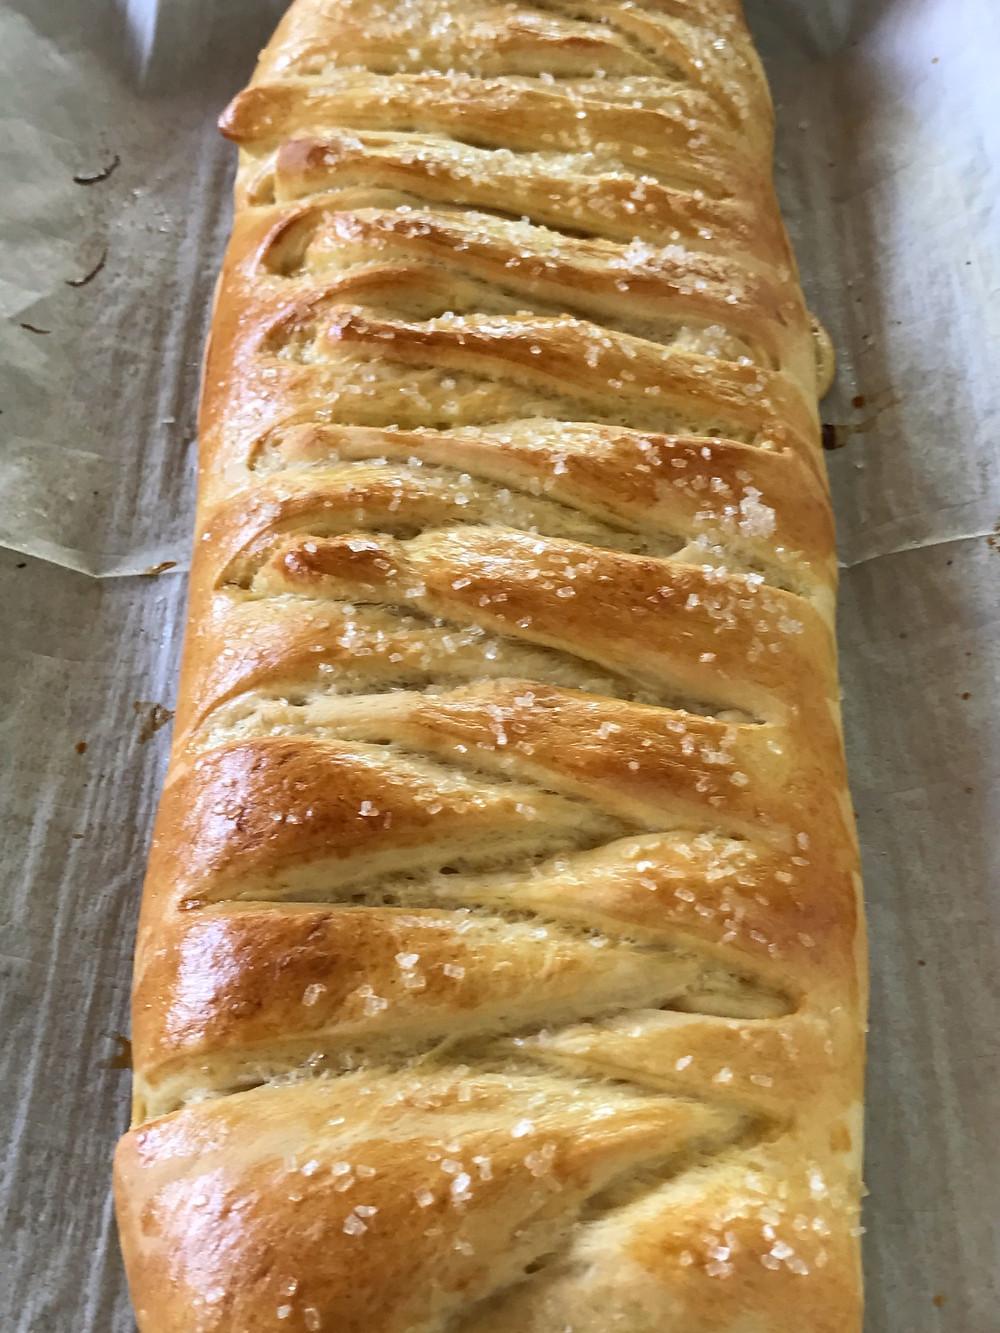 Cream Cheese and Raspberry pastry.